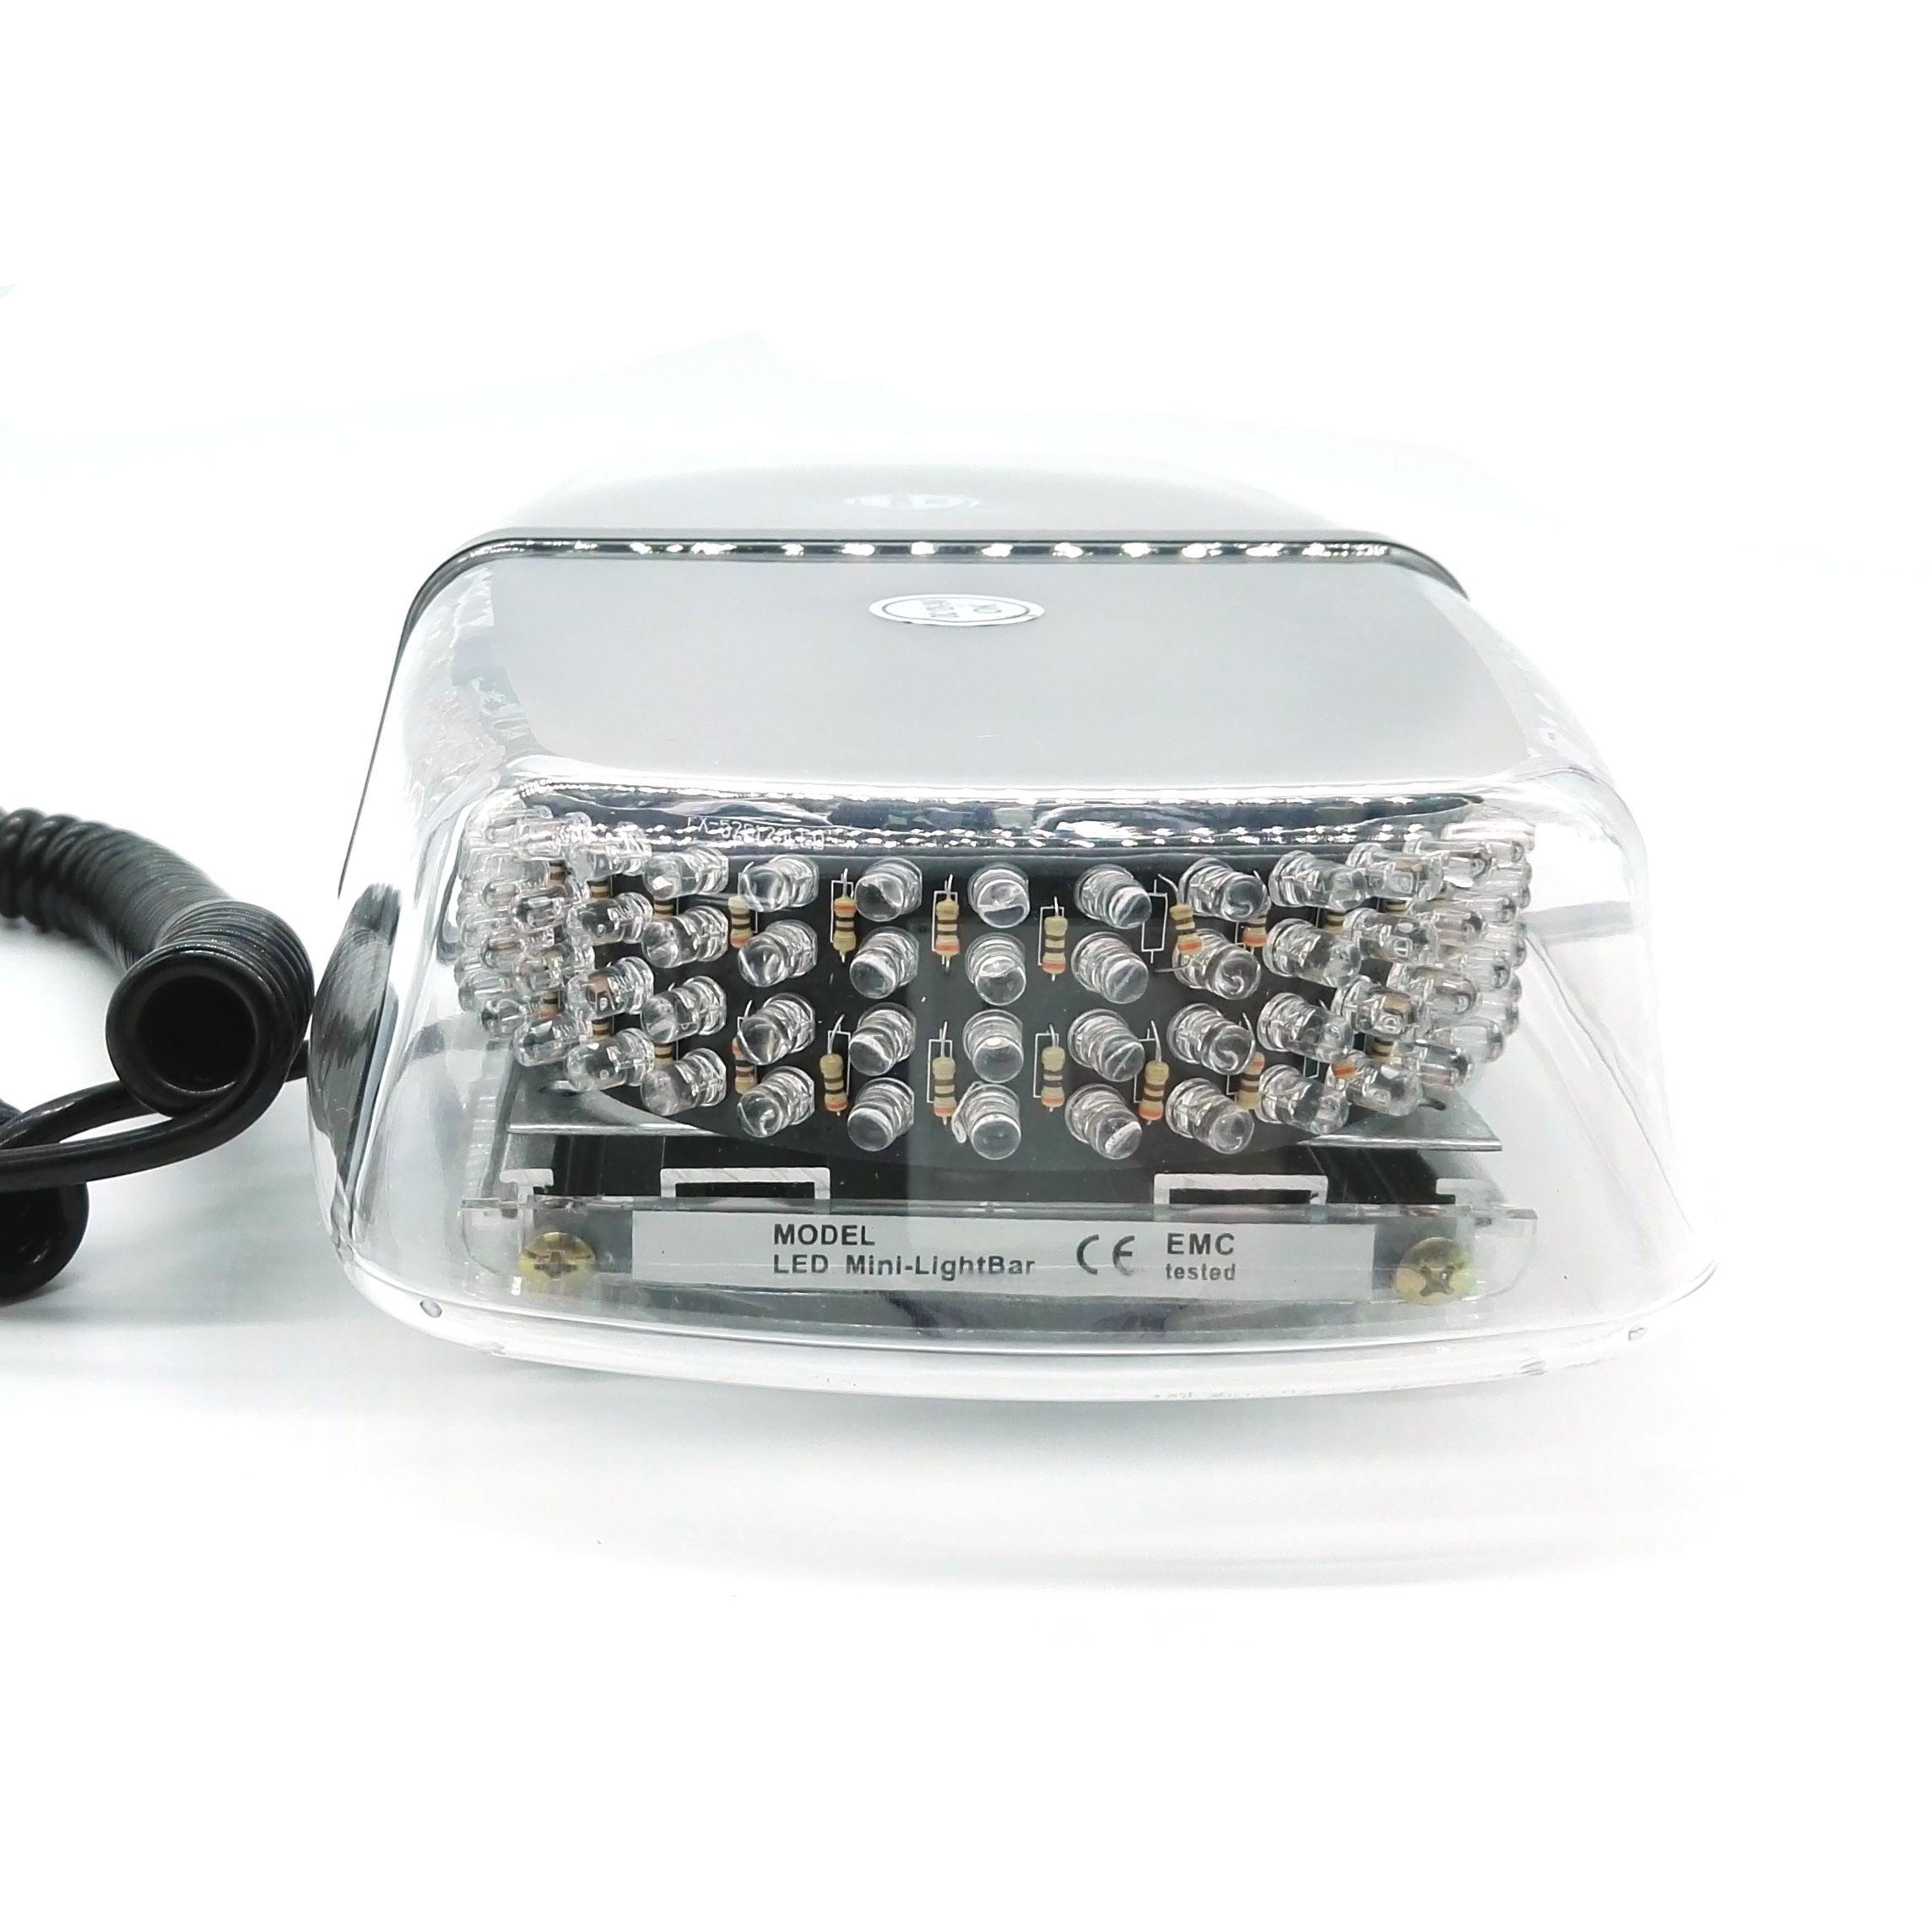 240 LED Emergency Warning Flashing Strobe Light Lamp vehicle Police Car Light DC12V White Yellow / amber